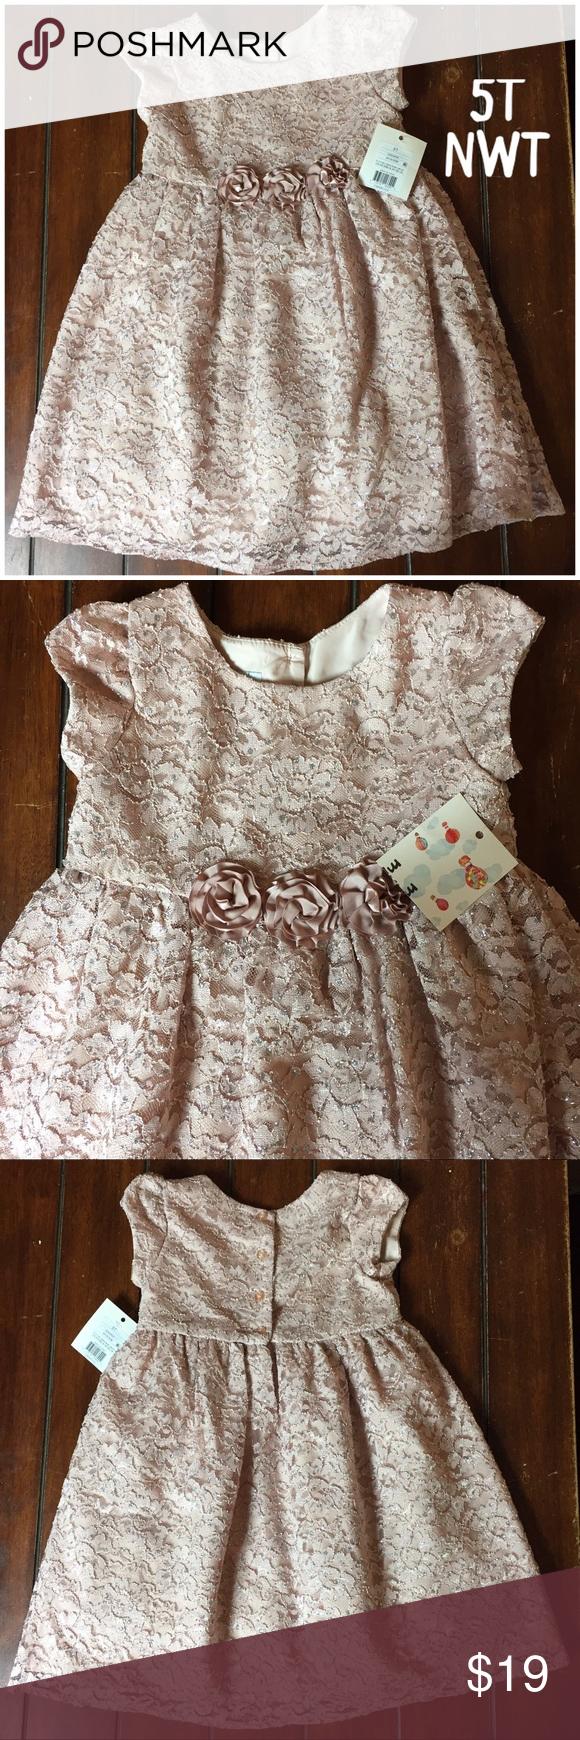 5t Nwt Mia And Mimi Blush Party Dress Beautiful Nwt Beige Party Dresses Mimi Dress Dresses [ 1740 x 580 Pixel ]